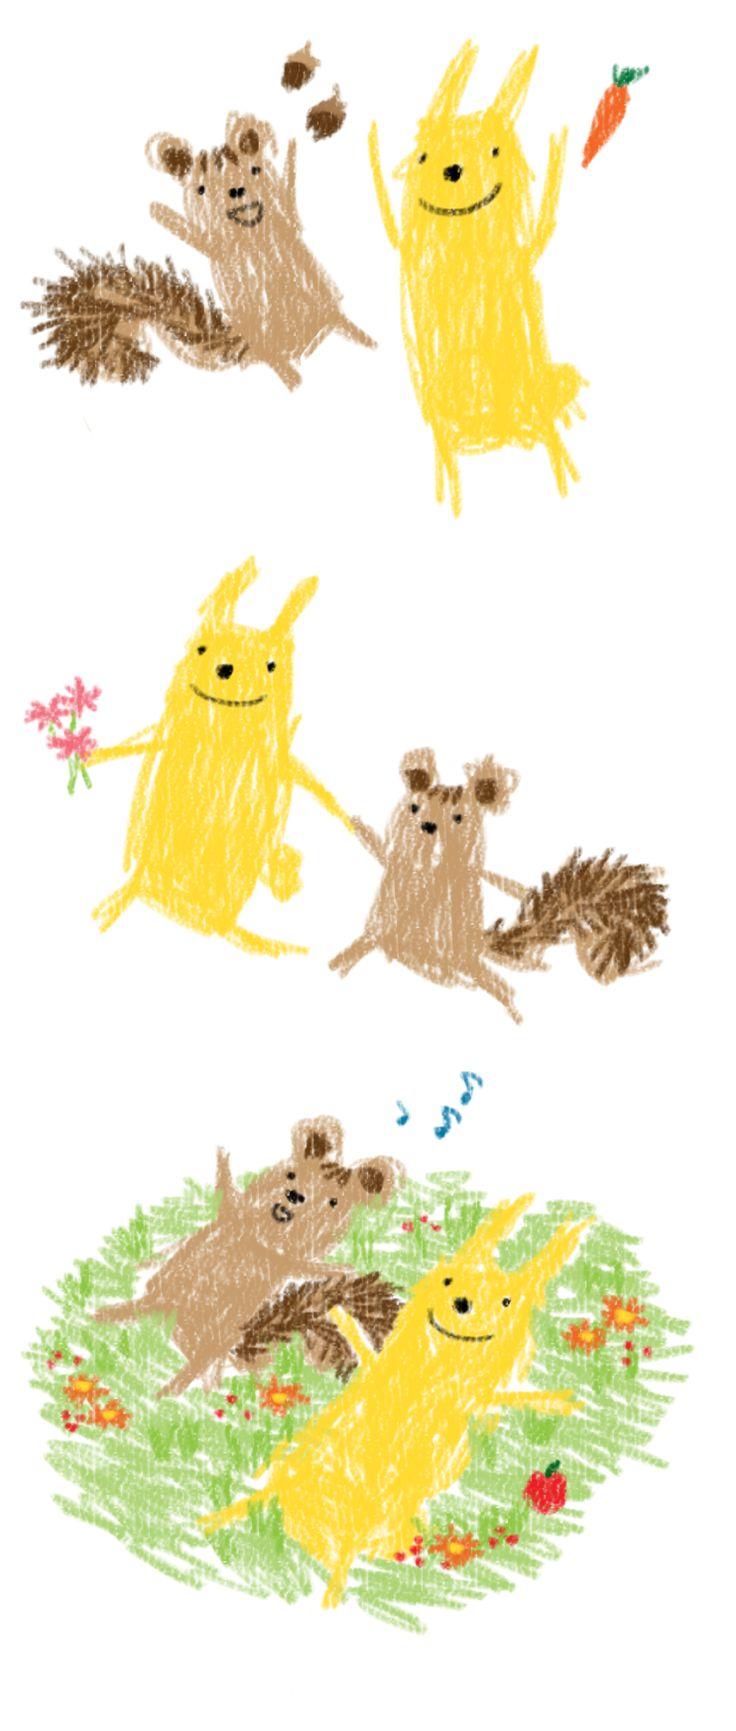 adorable rabbit and squirrel. illustrator_Heaven Kim